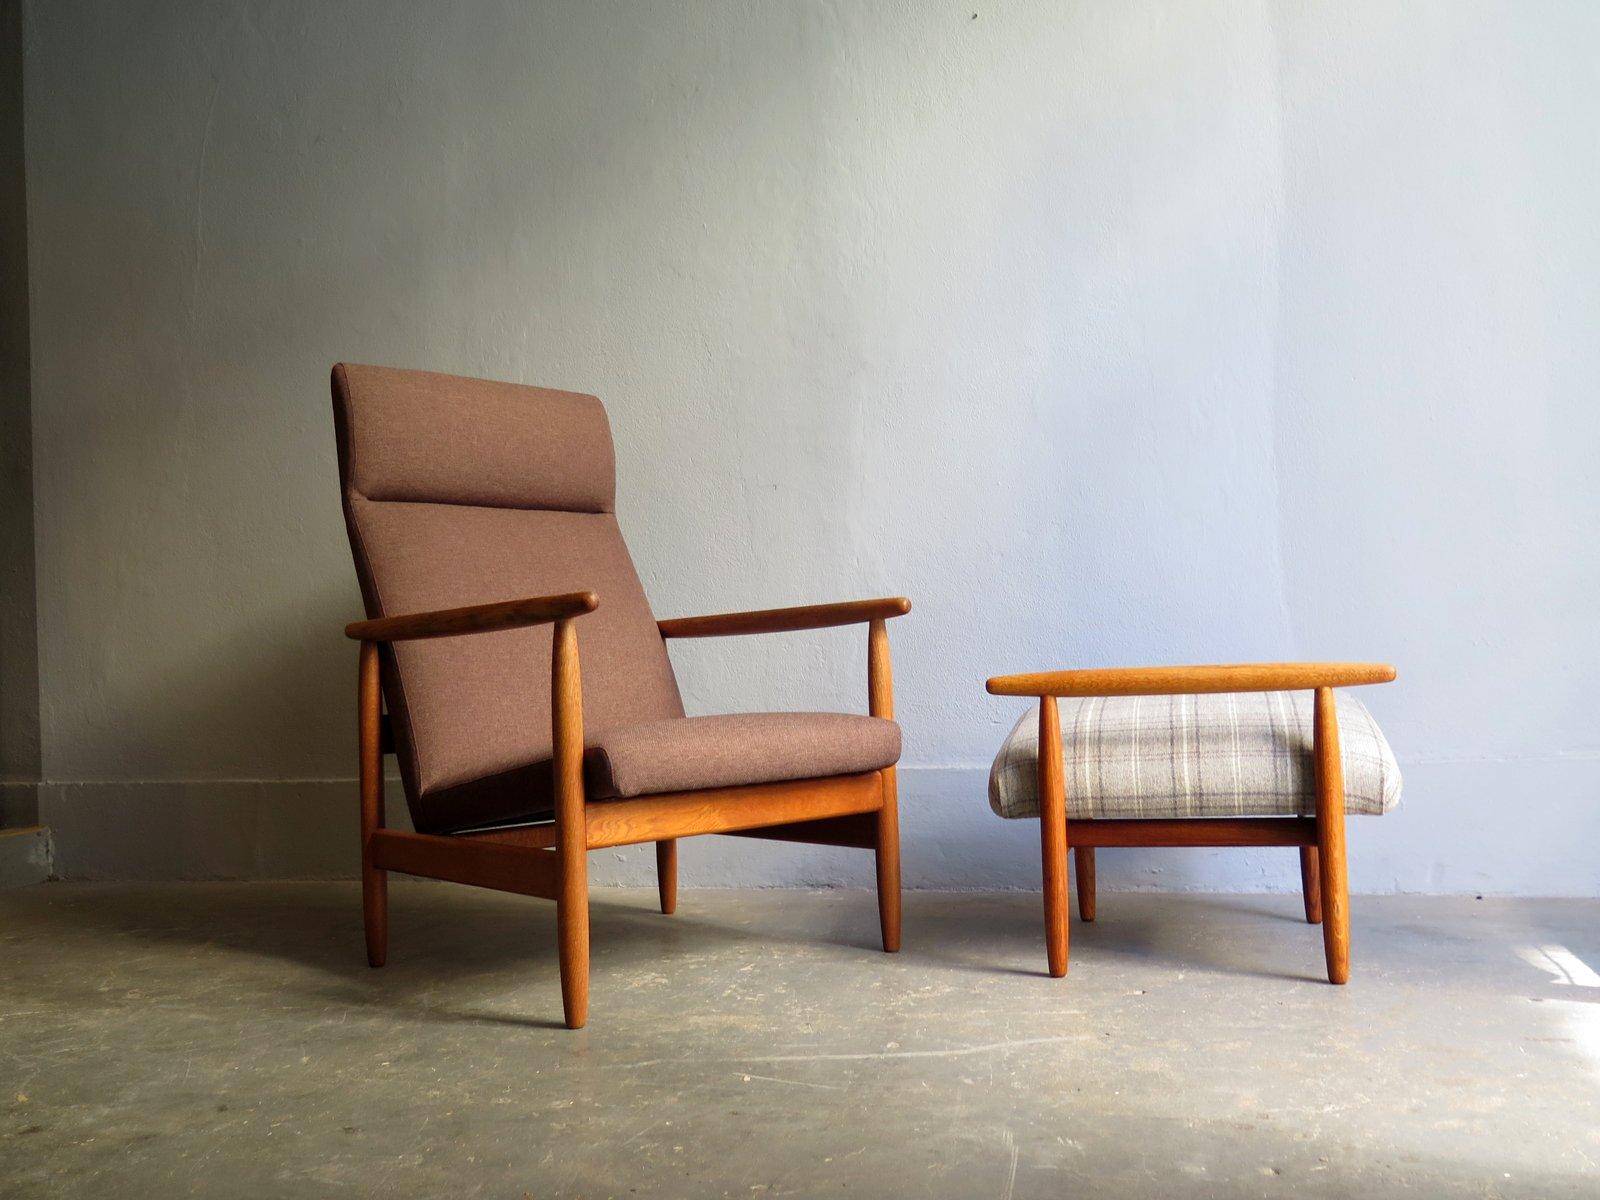 Vintage eichenholz stuhl hocker von ejvind johansson f r for Stuhl hocker